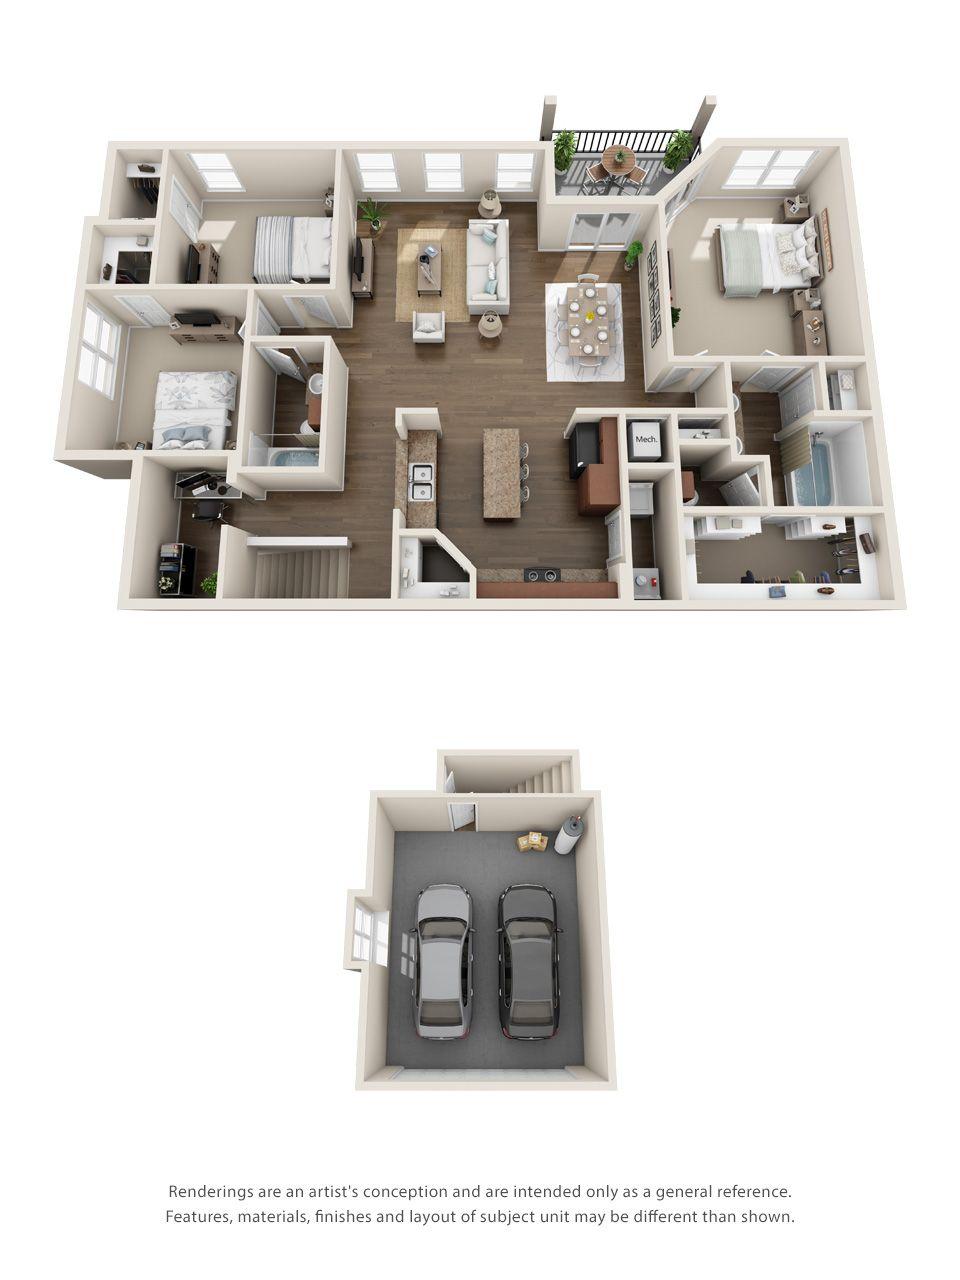 Luxury 1 2 And 3 Bedroom Suwanee Apartments For Rent Steadfast Apartment Rental Suwanee Georgia Apartments For Rent Sims House Design Apartment